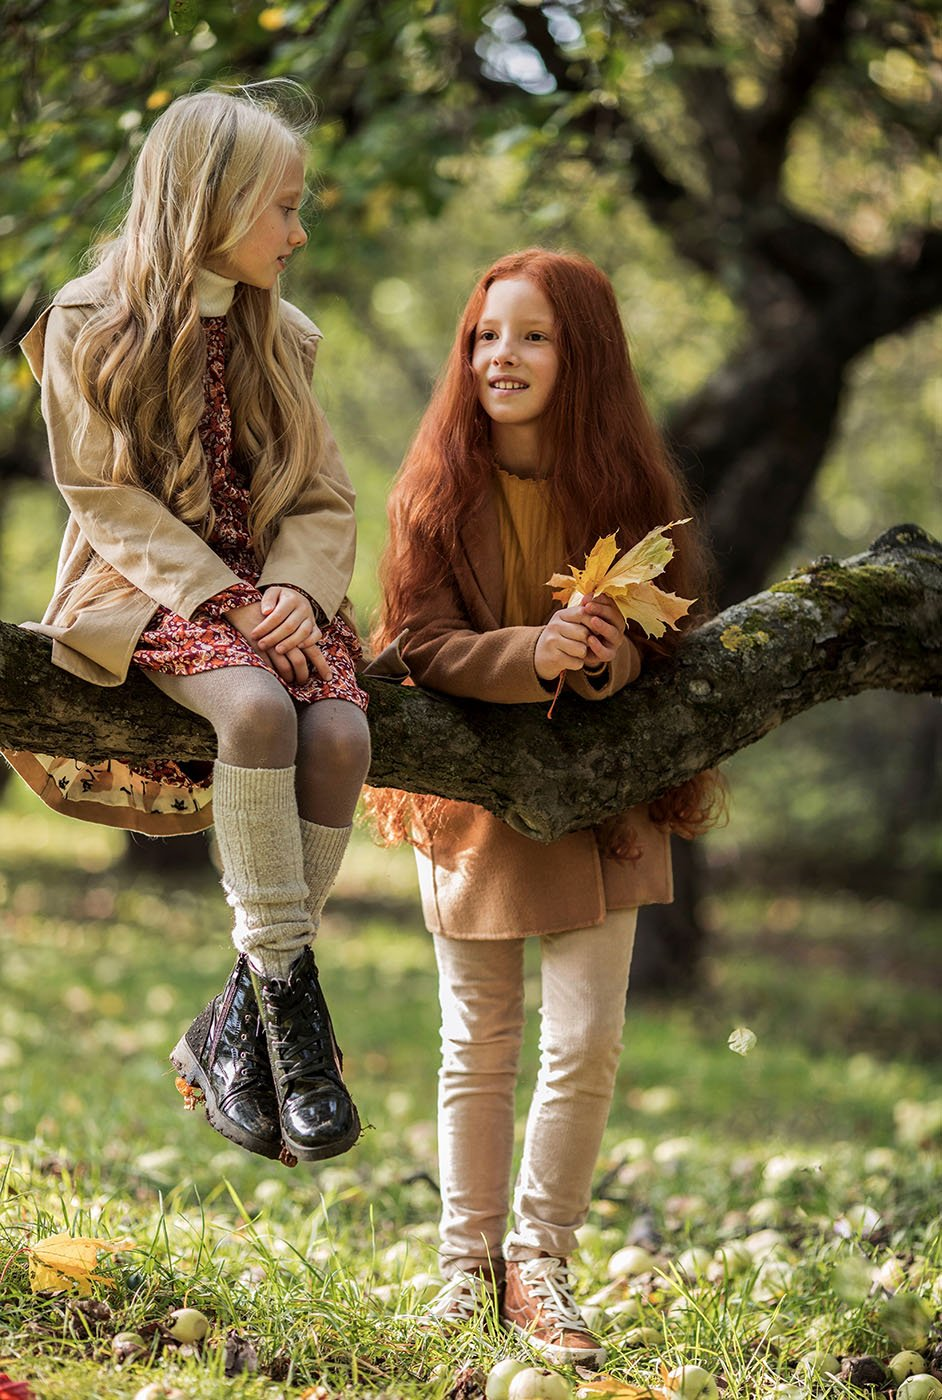 девочки, подружки,красотки, прогулка,лес, плэнер, girls, children, beautiful, pretty, girlfriends, woodland, Стукалова Юлия